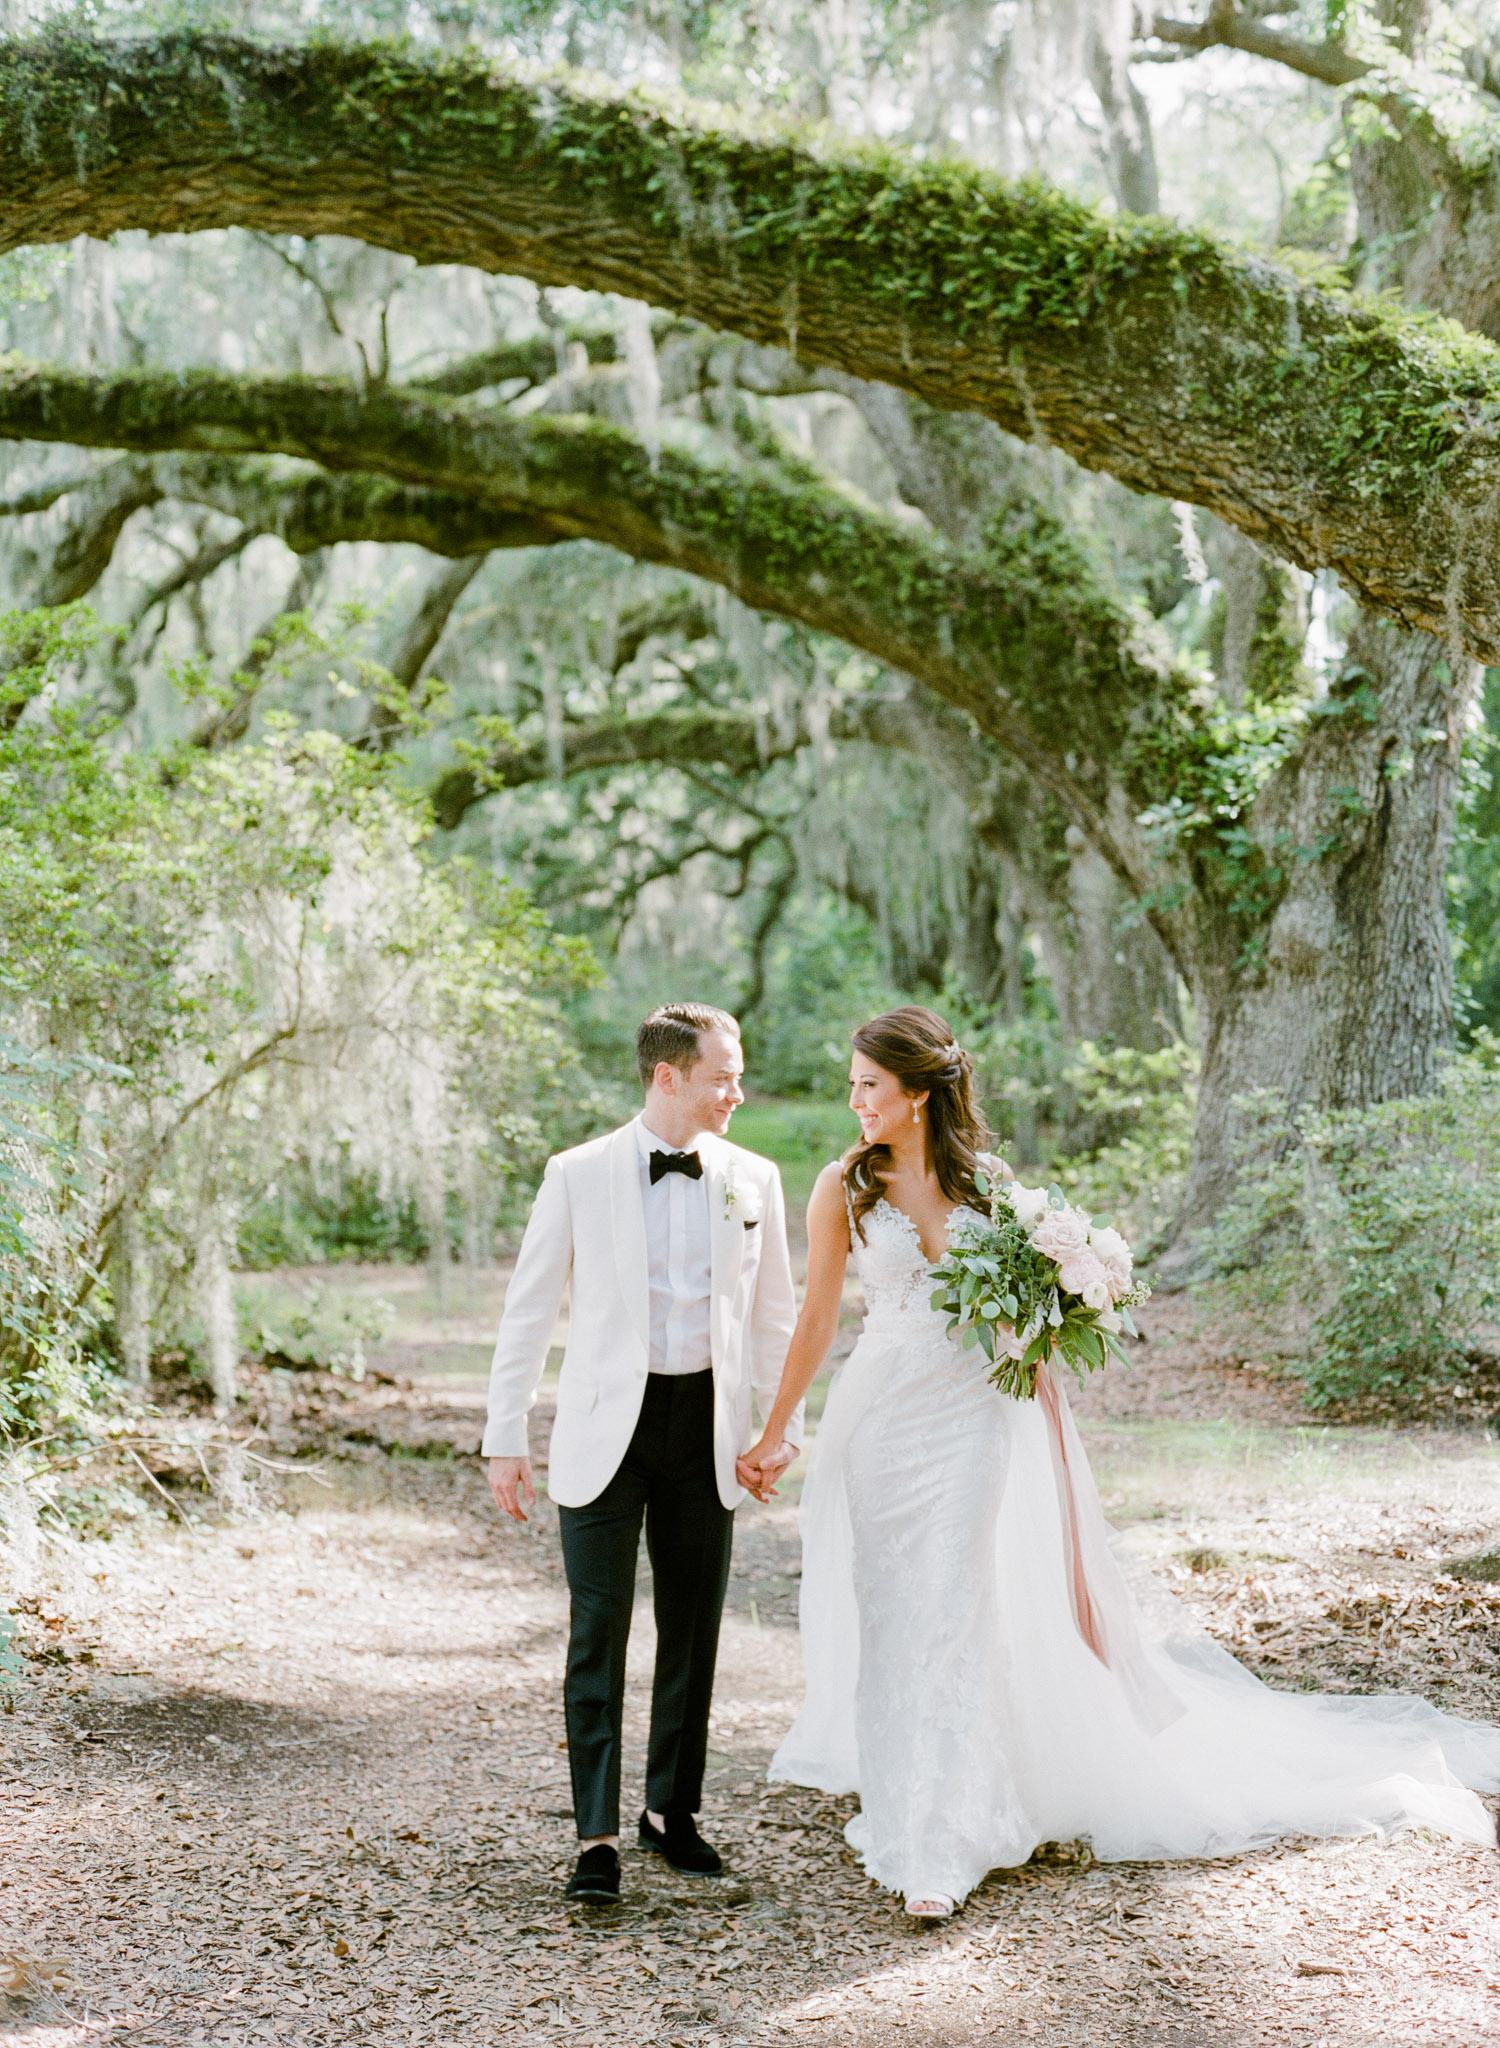 Charleston-Wedding-Venue-Magnolia-Plantation-1.jpg